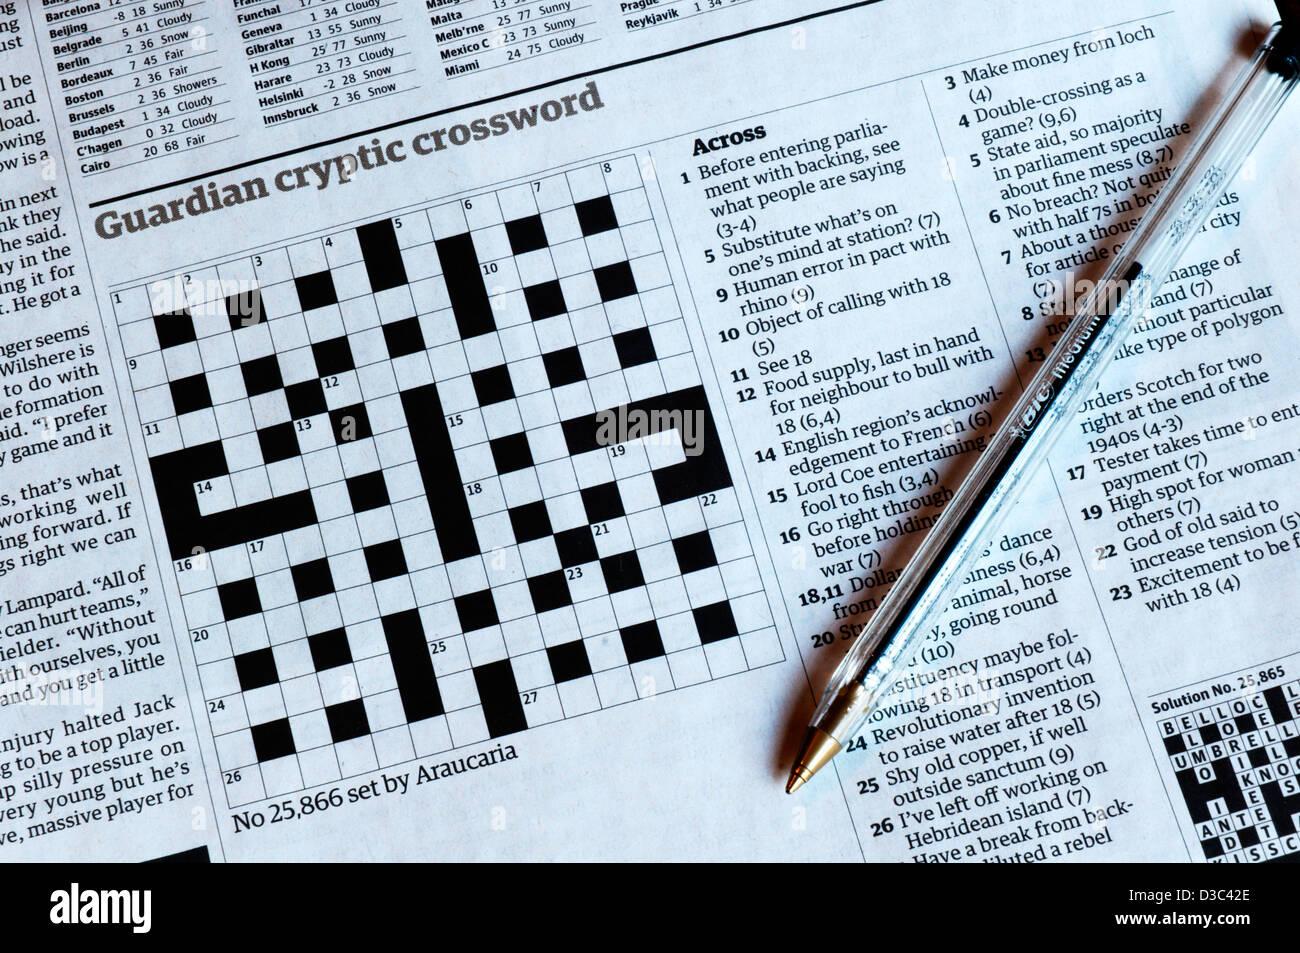 Cryptic Crossword Stock Photos & Cryptic Crossword Stock Images - Alamy